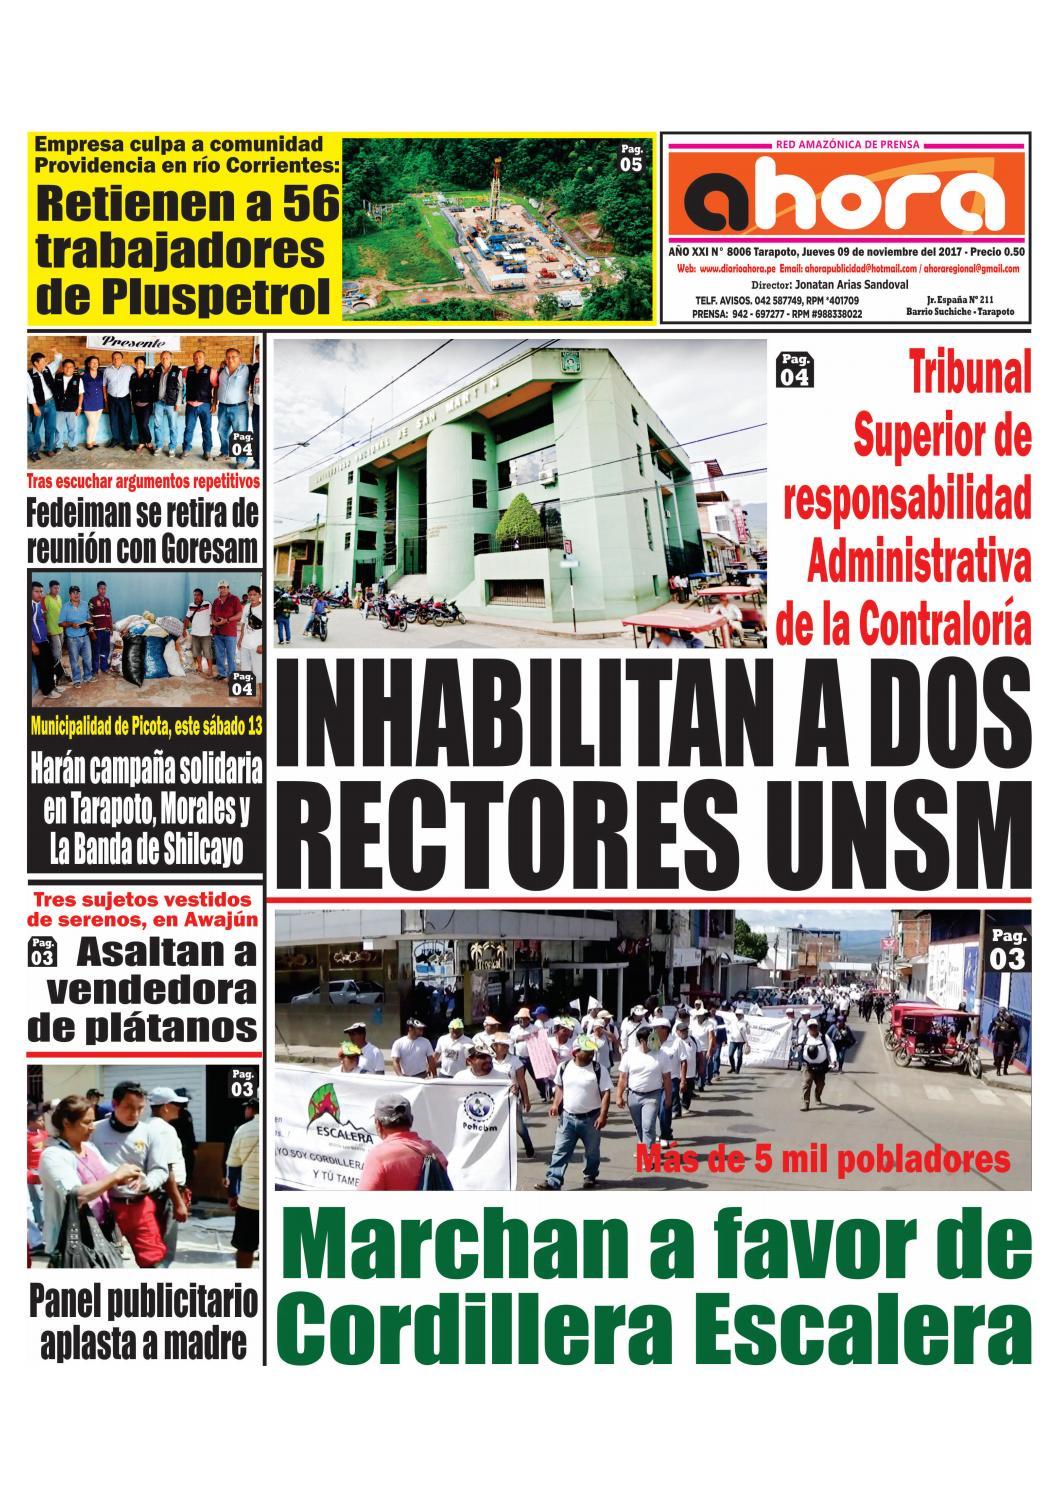 Tarapoto 09 de noviembre de 2017 by Jonatan Arias - issuu